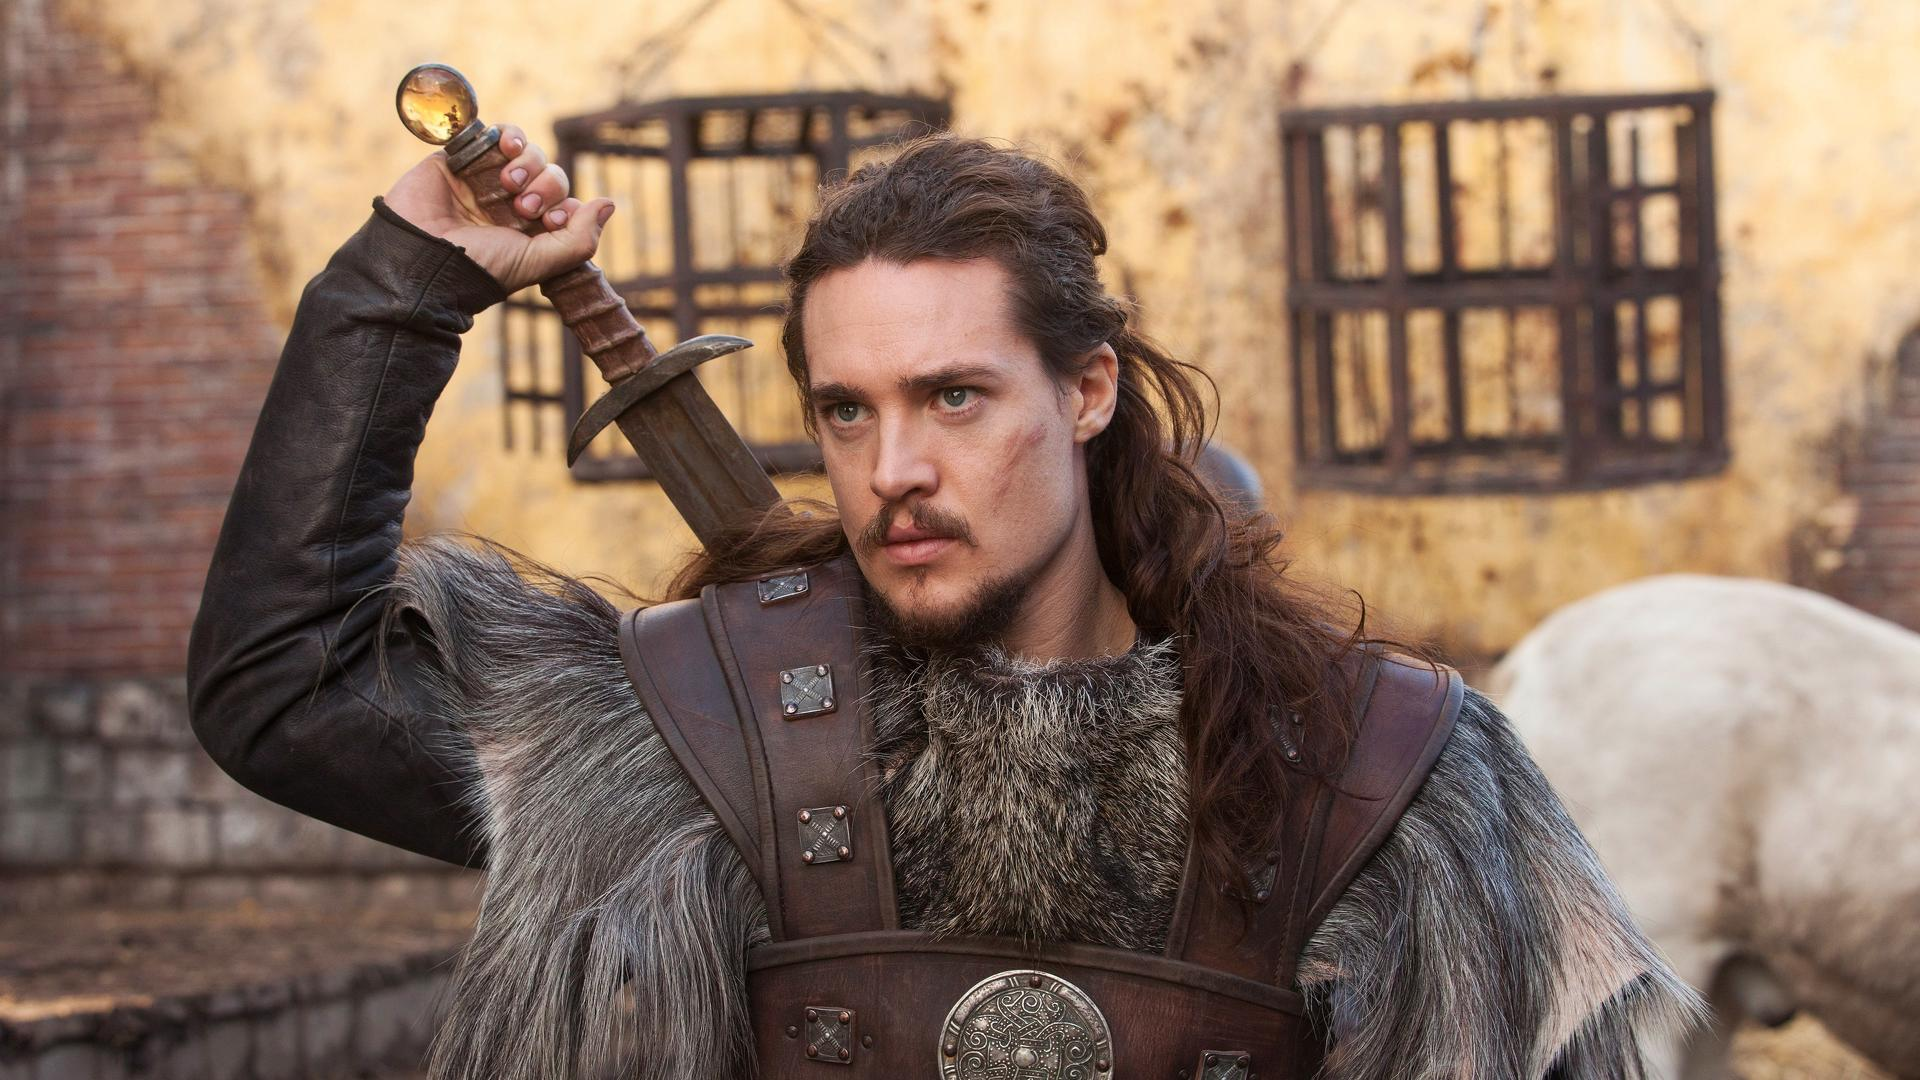 The Last Kingdom (S01E07): Season 1, Episode 7 Summary